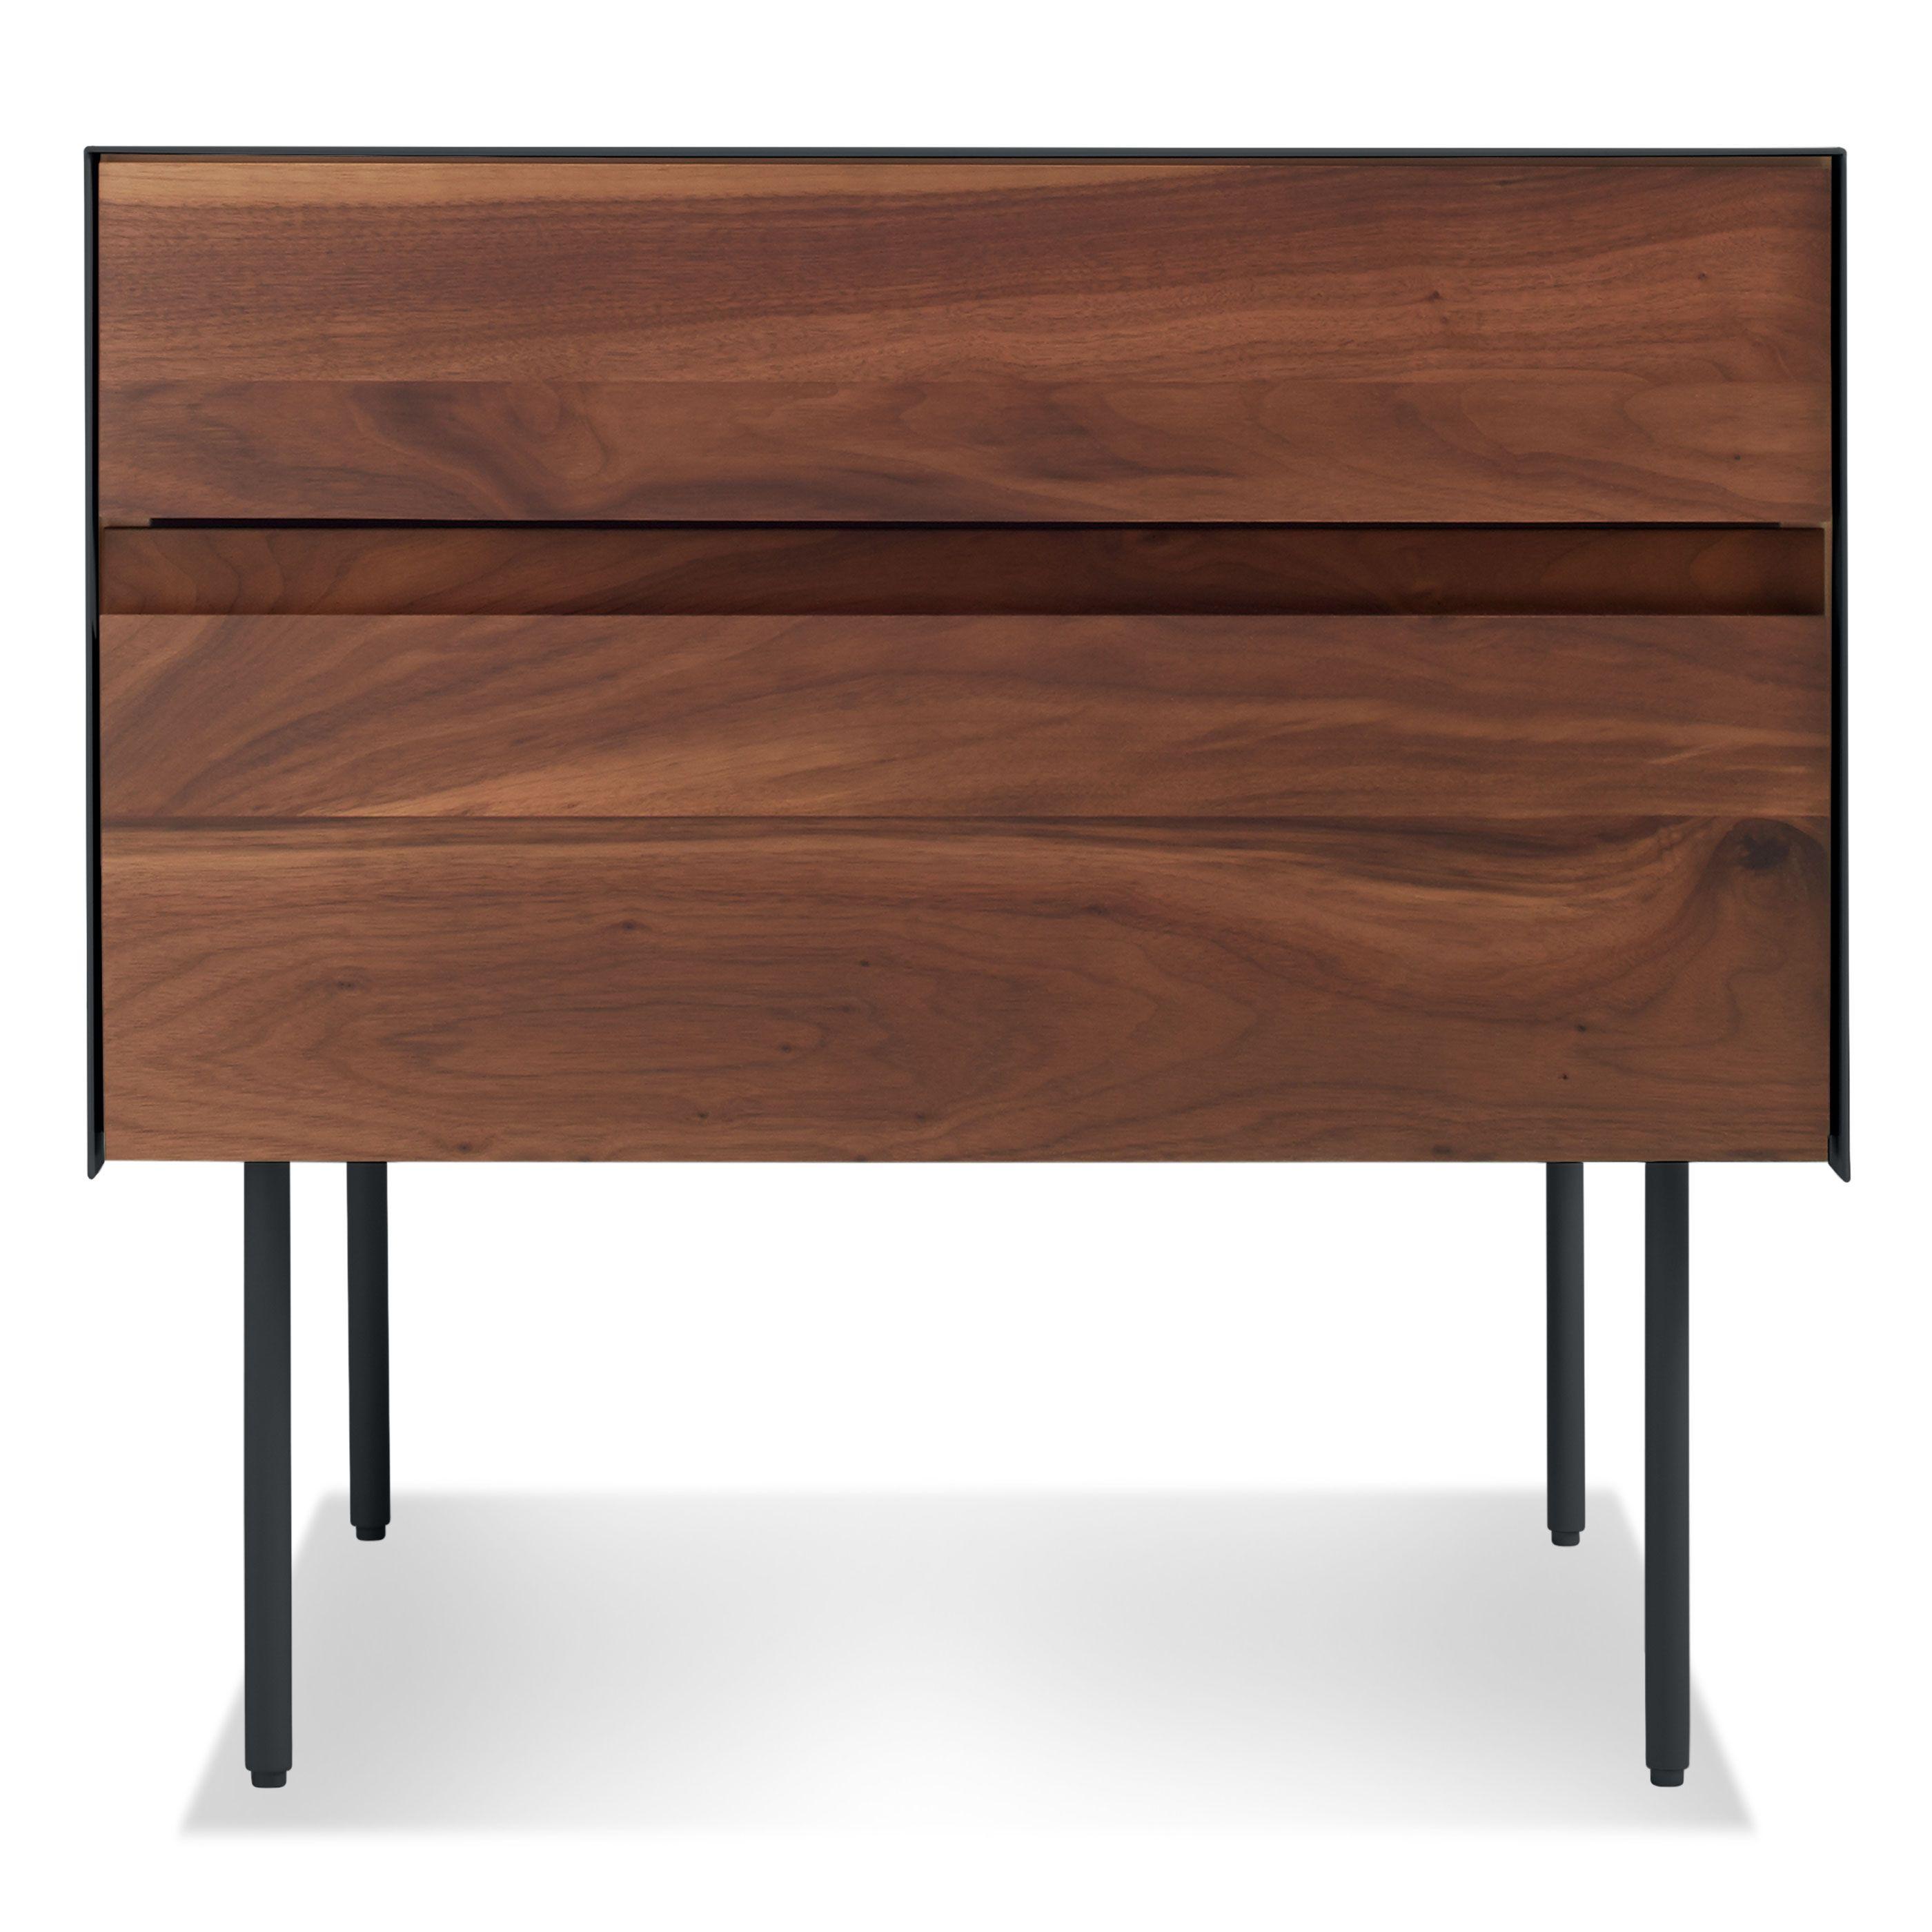 clad nightstand modern bedside table side table blu dot